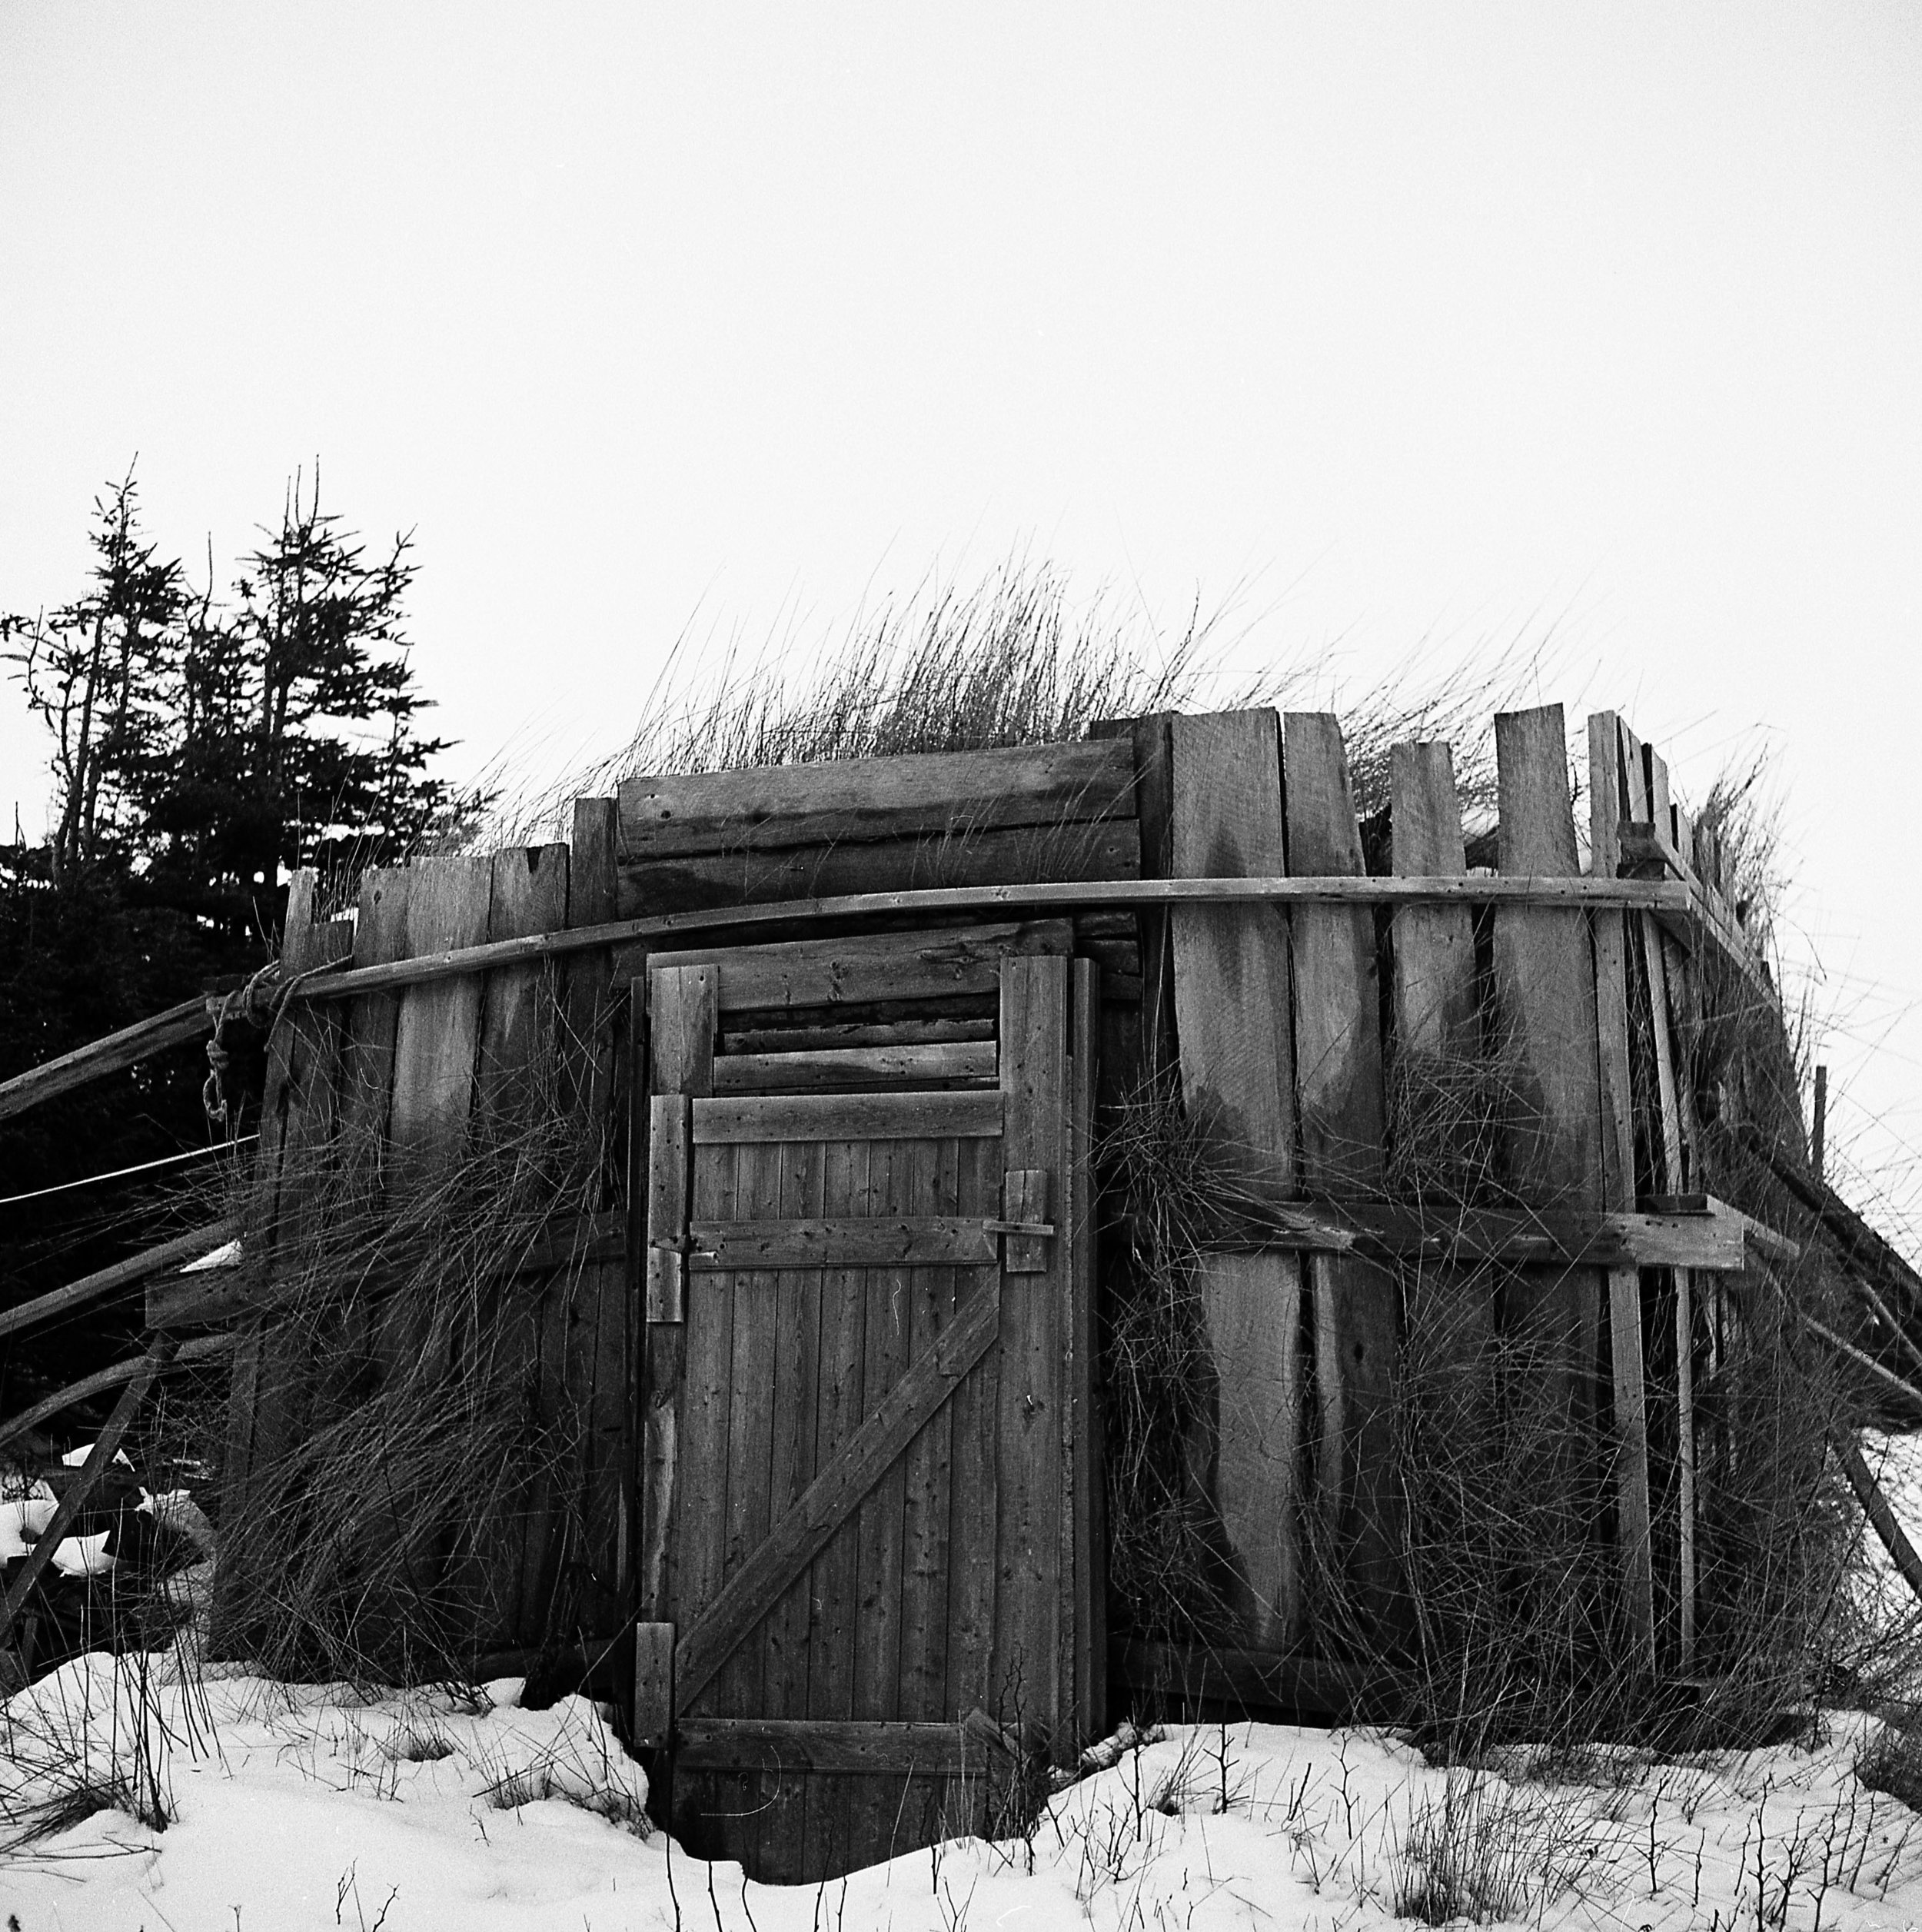 Root cellar, Change Islands, Newfoundland